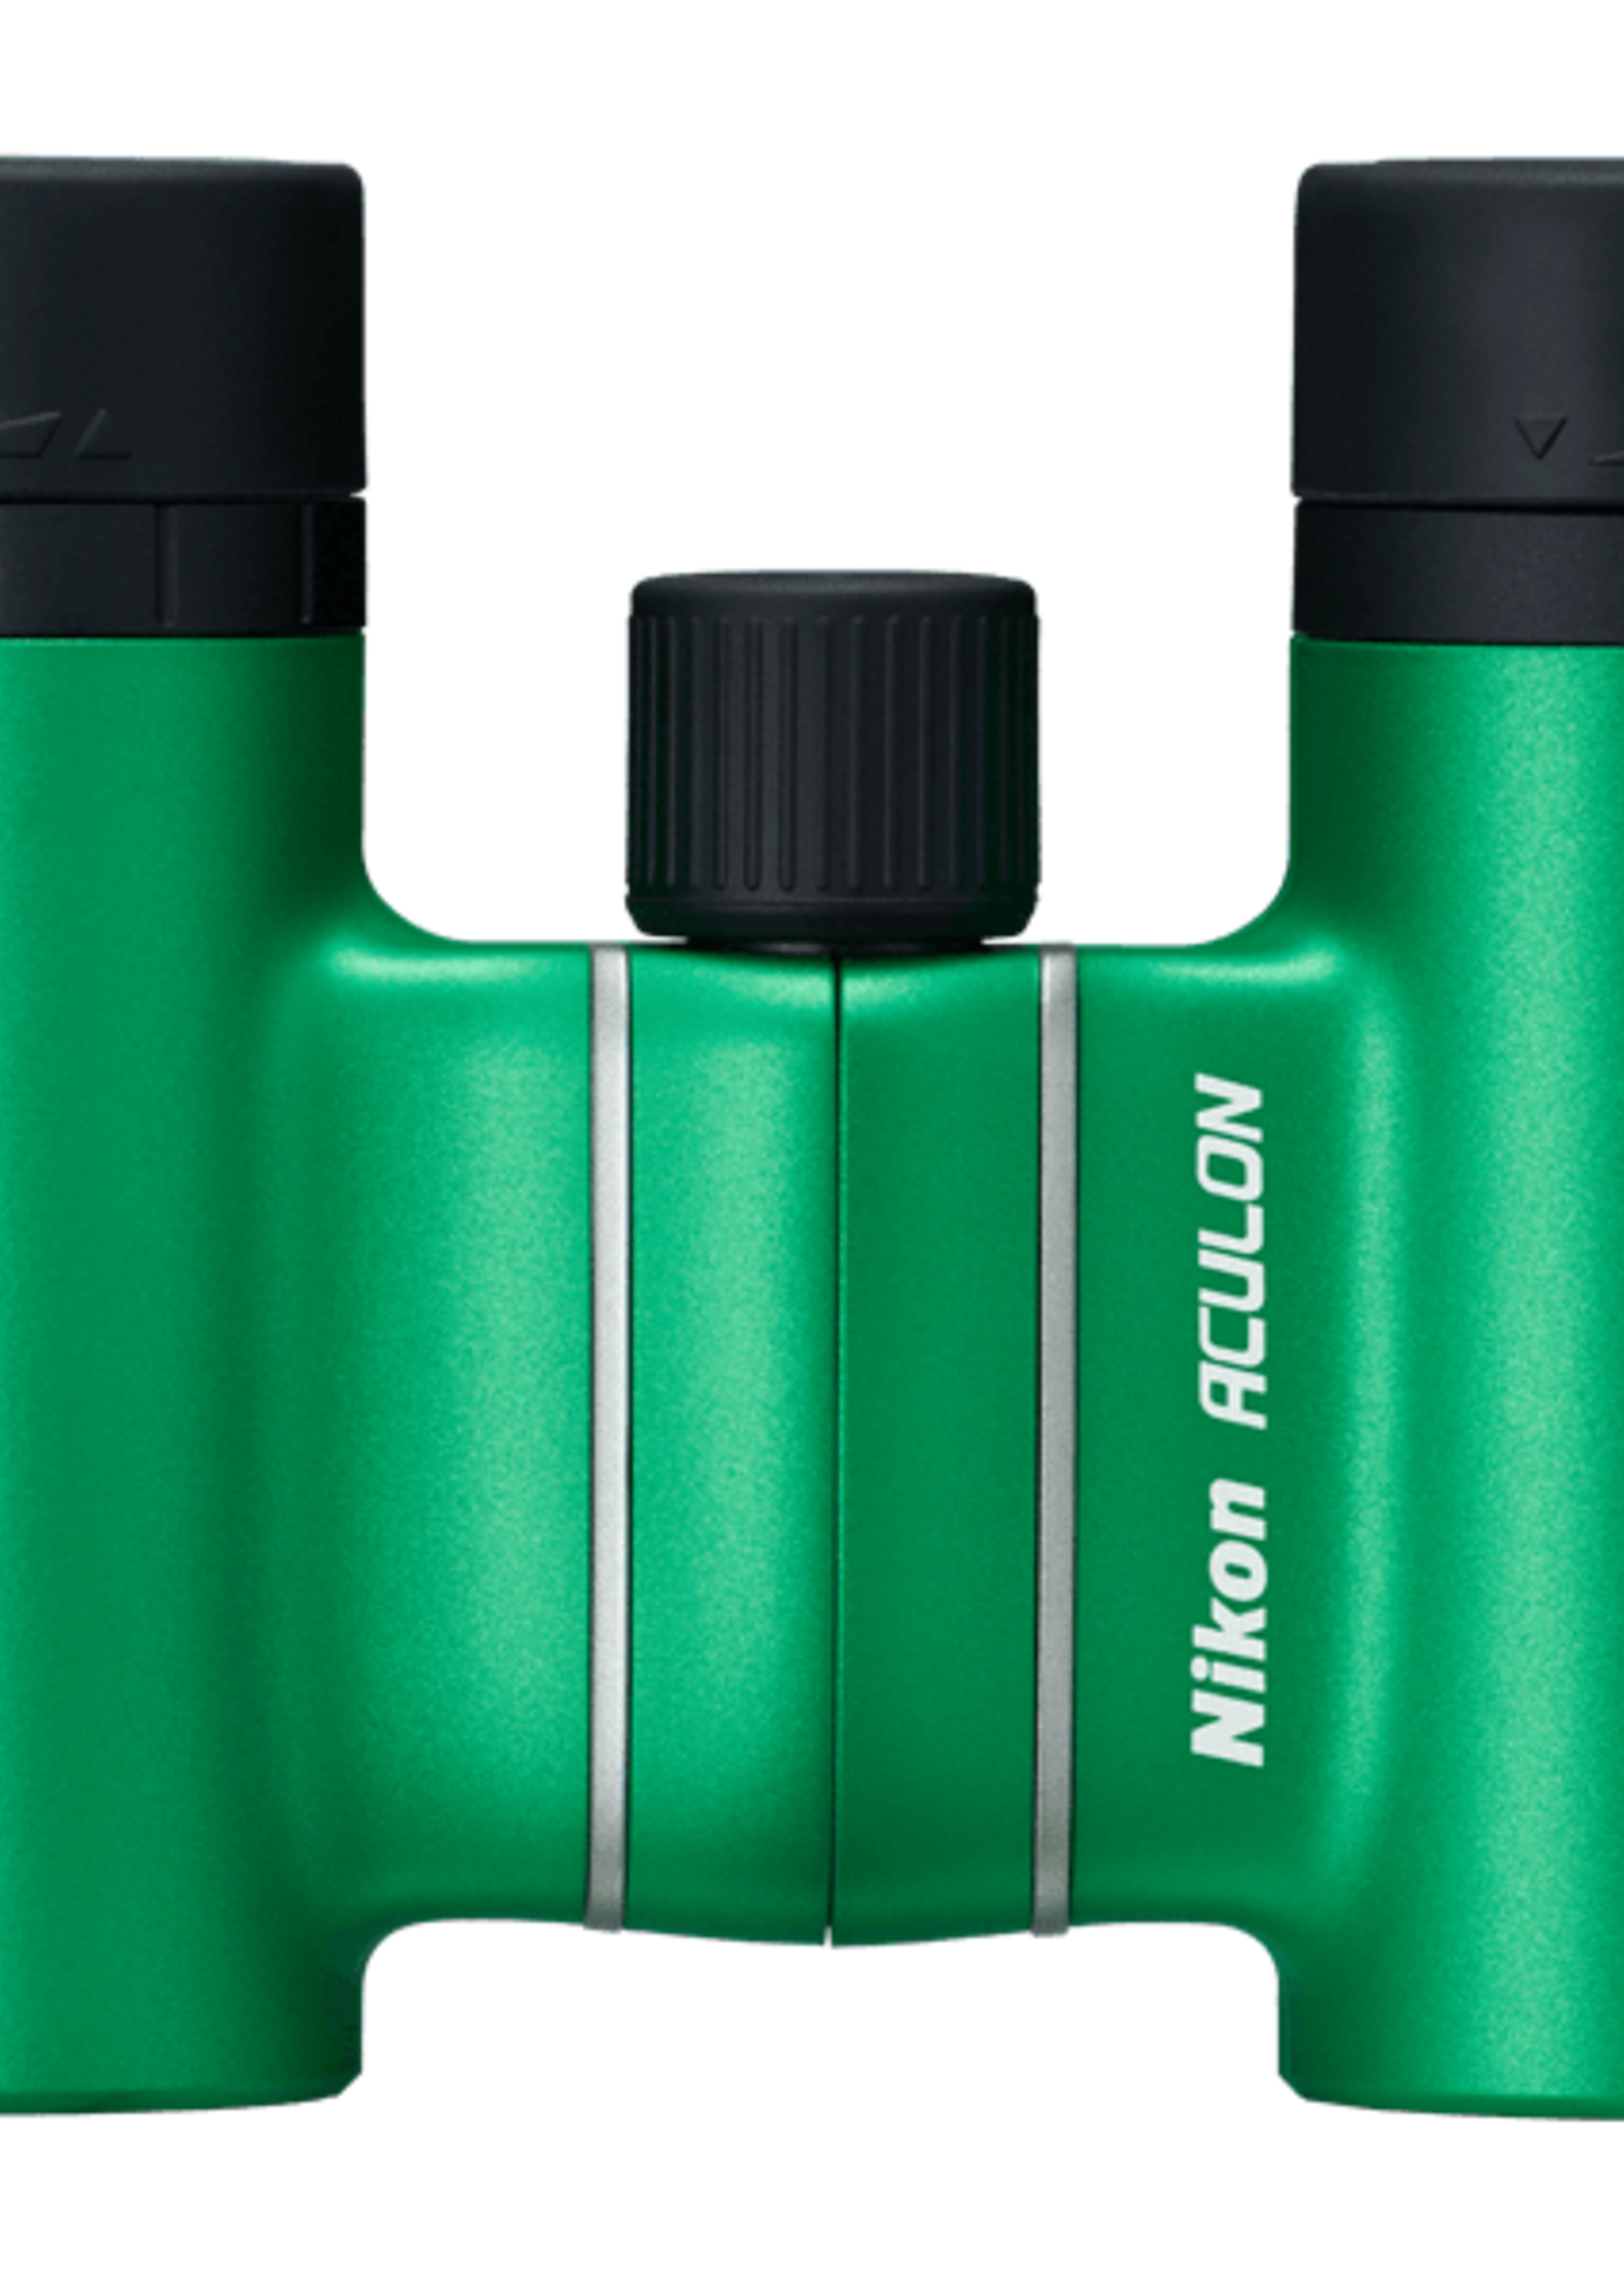 Nikon inc Nikon Aculon T02 8x21 Green